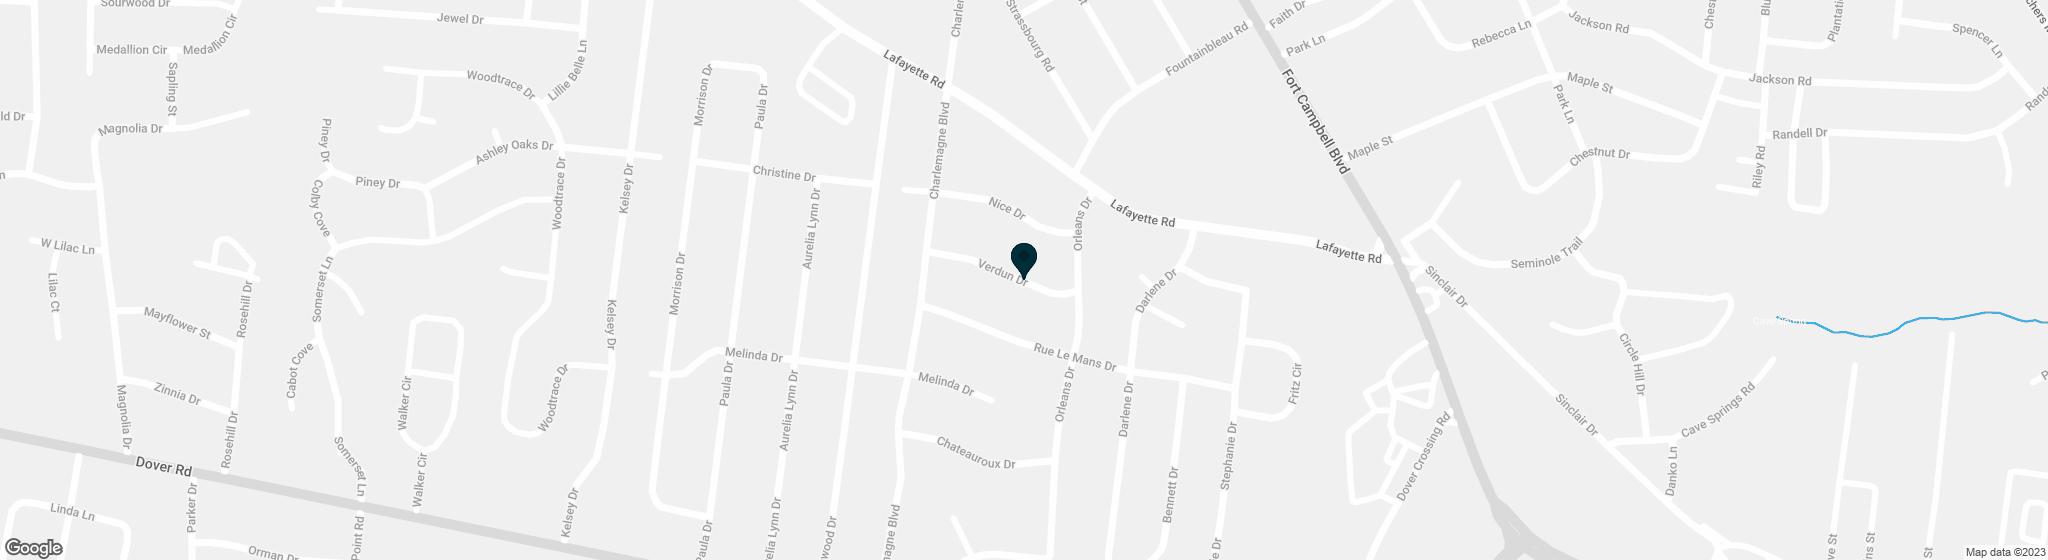 1096 Veridian Drive Unit 28B Clarksville TN 37043